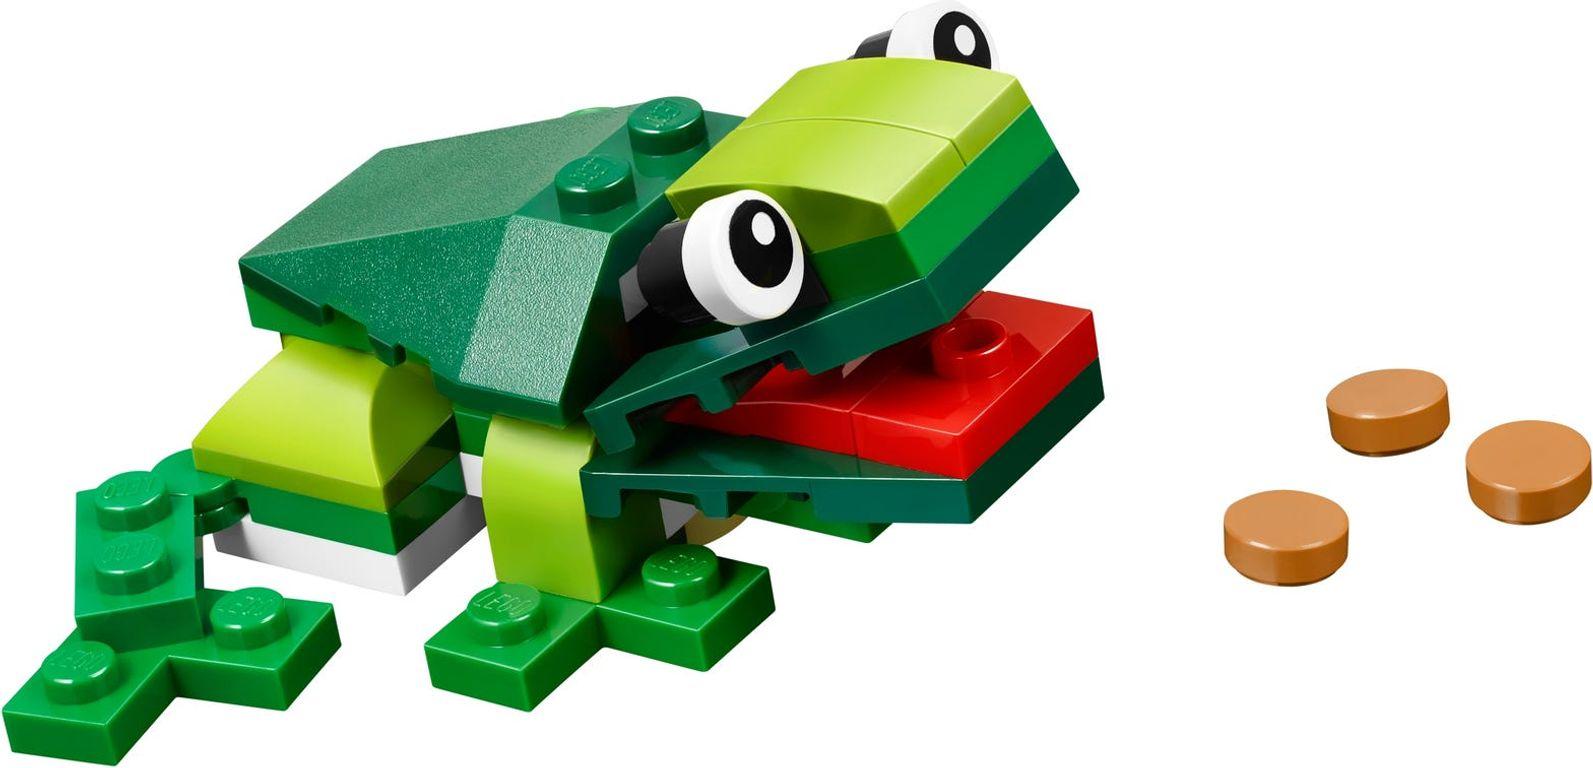 Rainforest Animals components